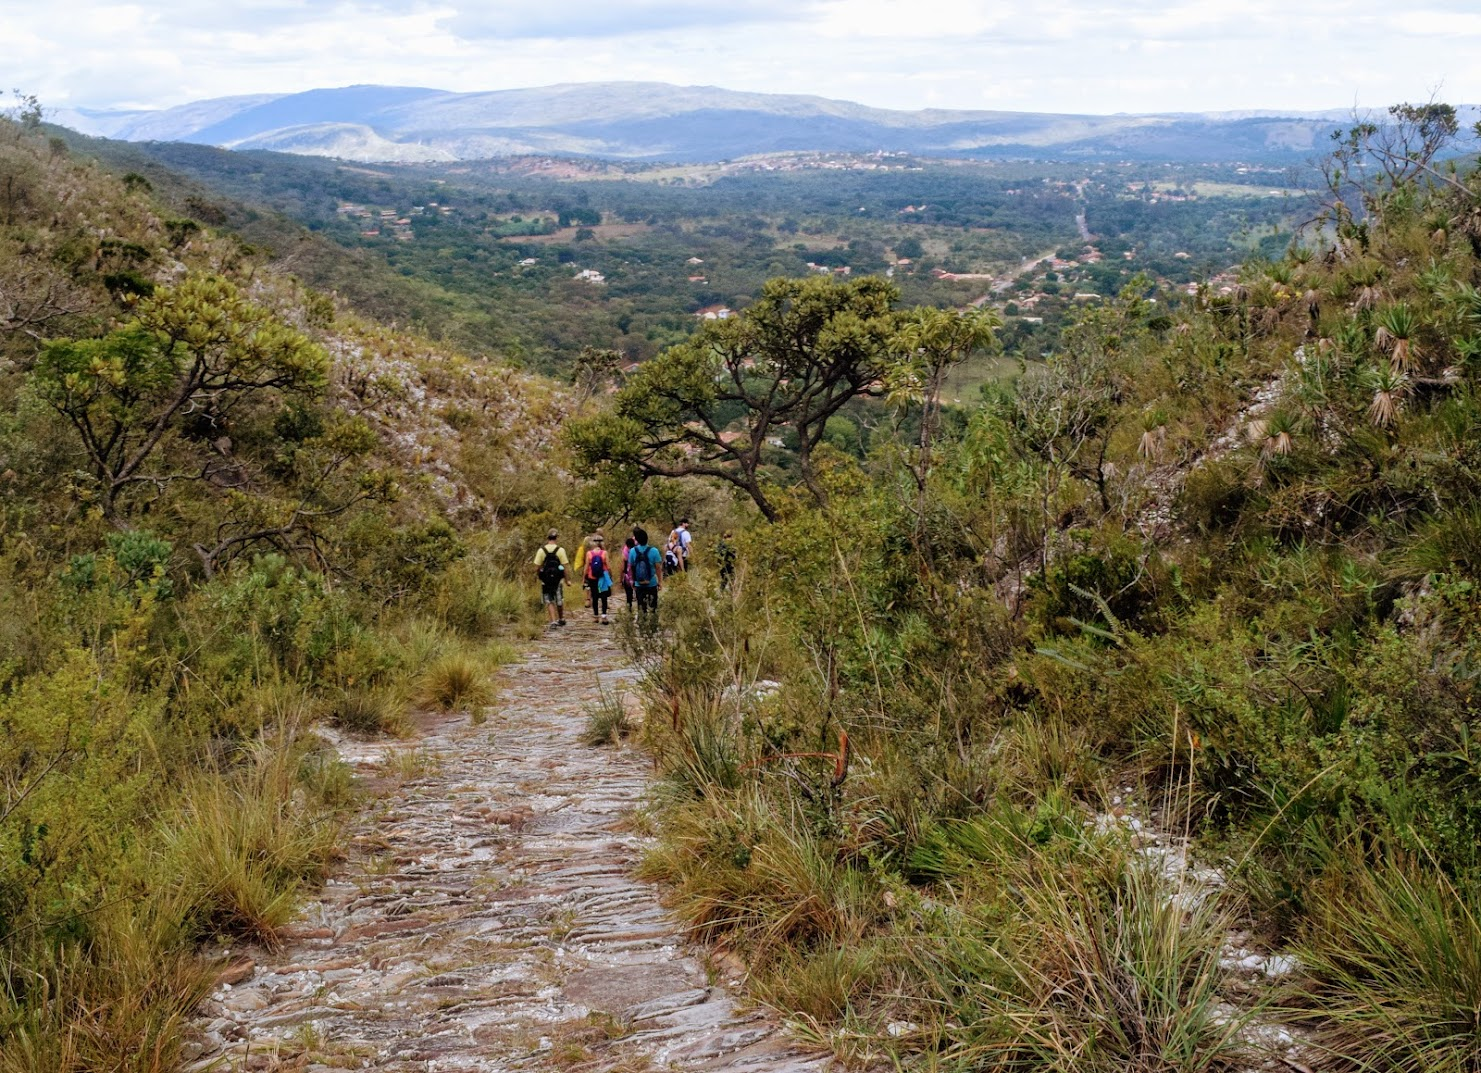 Descida para finalizar a Trilha dos Escravos, com vista para o distrito de Serra do Cipó